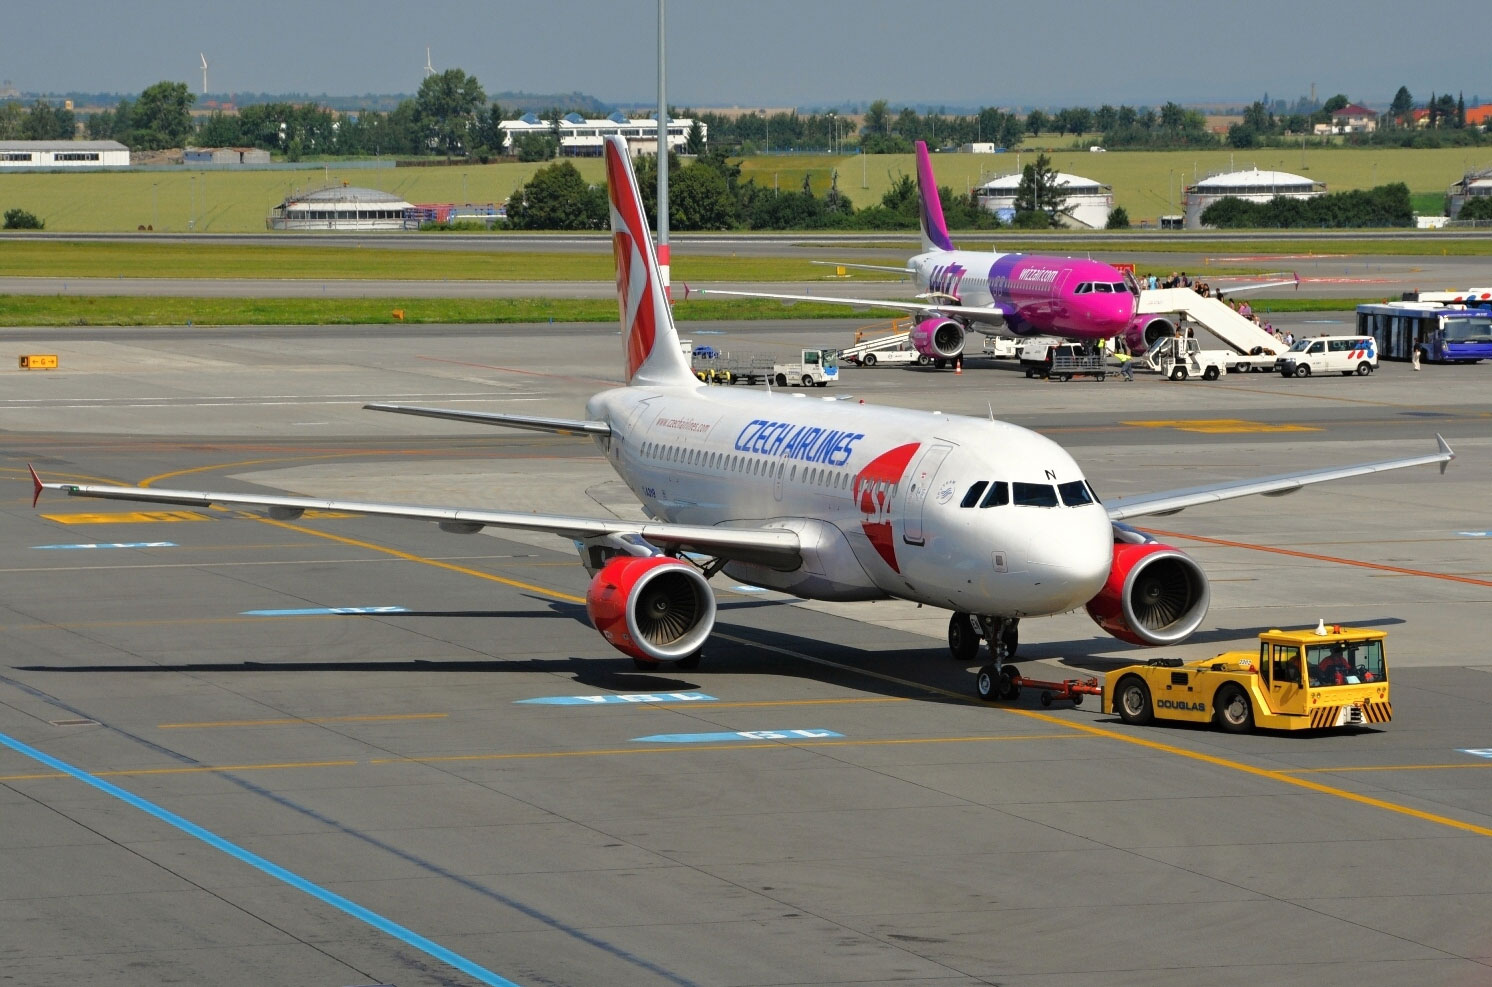 Airbus a319 схема салона чешские авиалинии